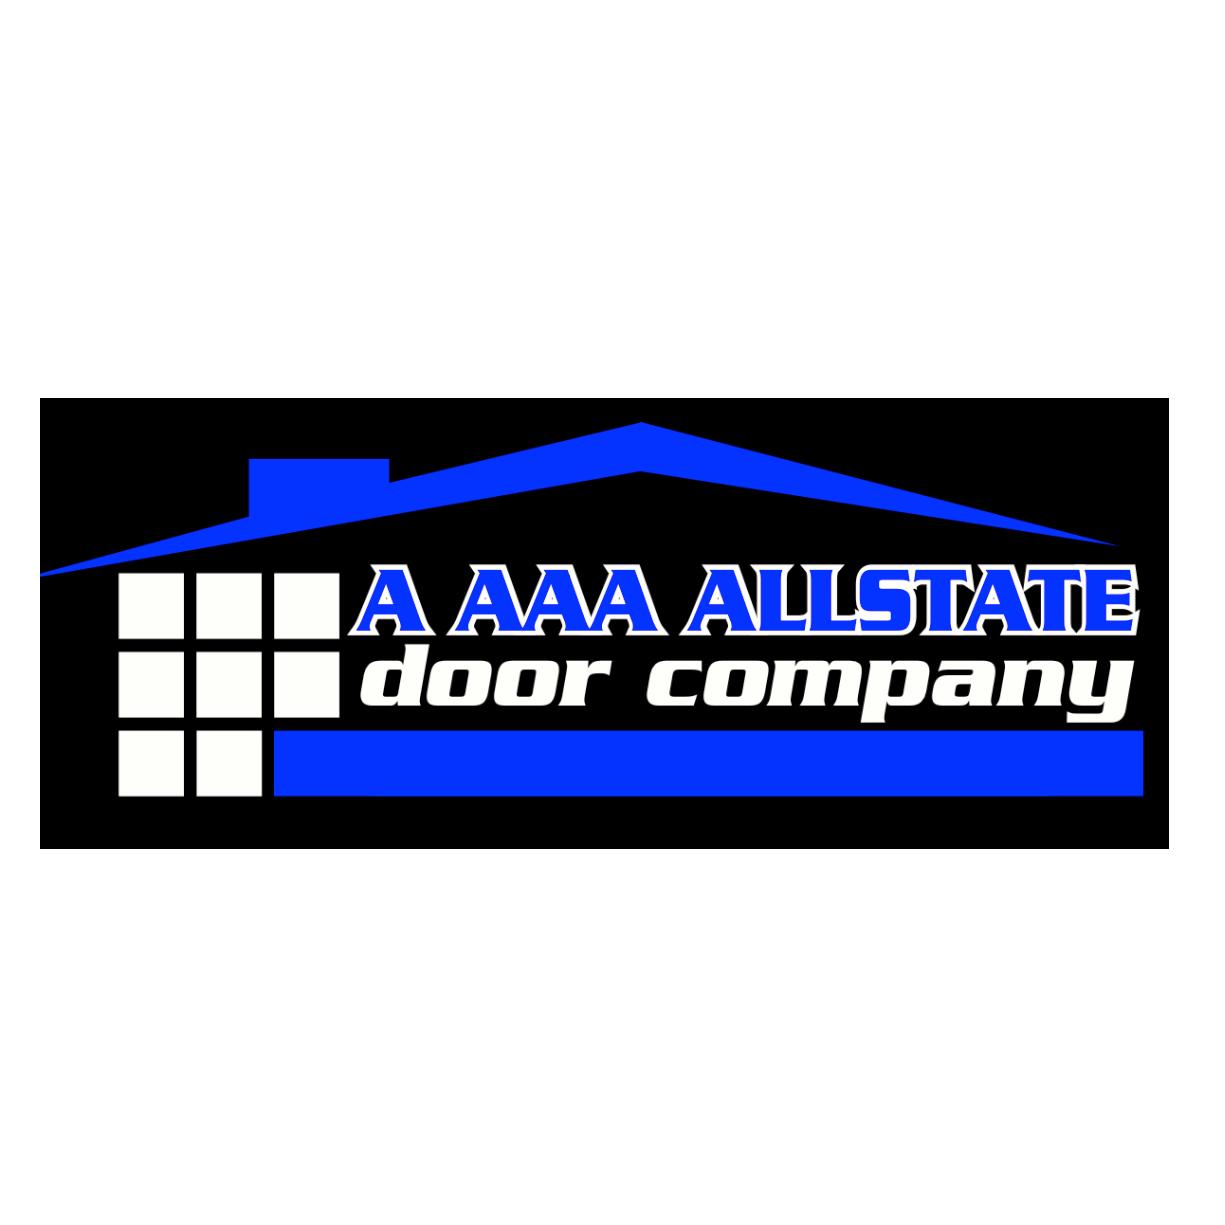 A aaa allstate door company las vegas nevada nv for Local door companies